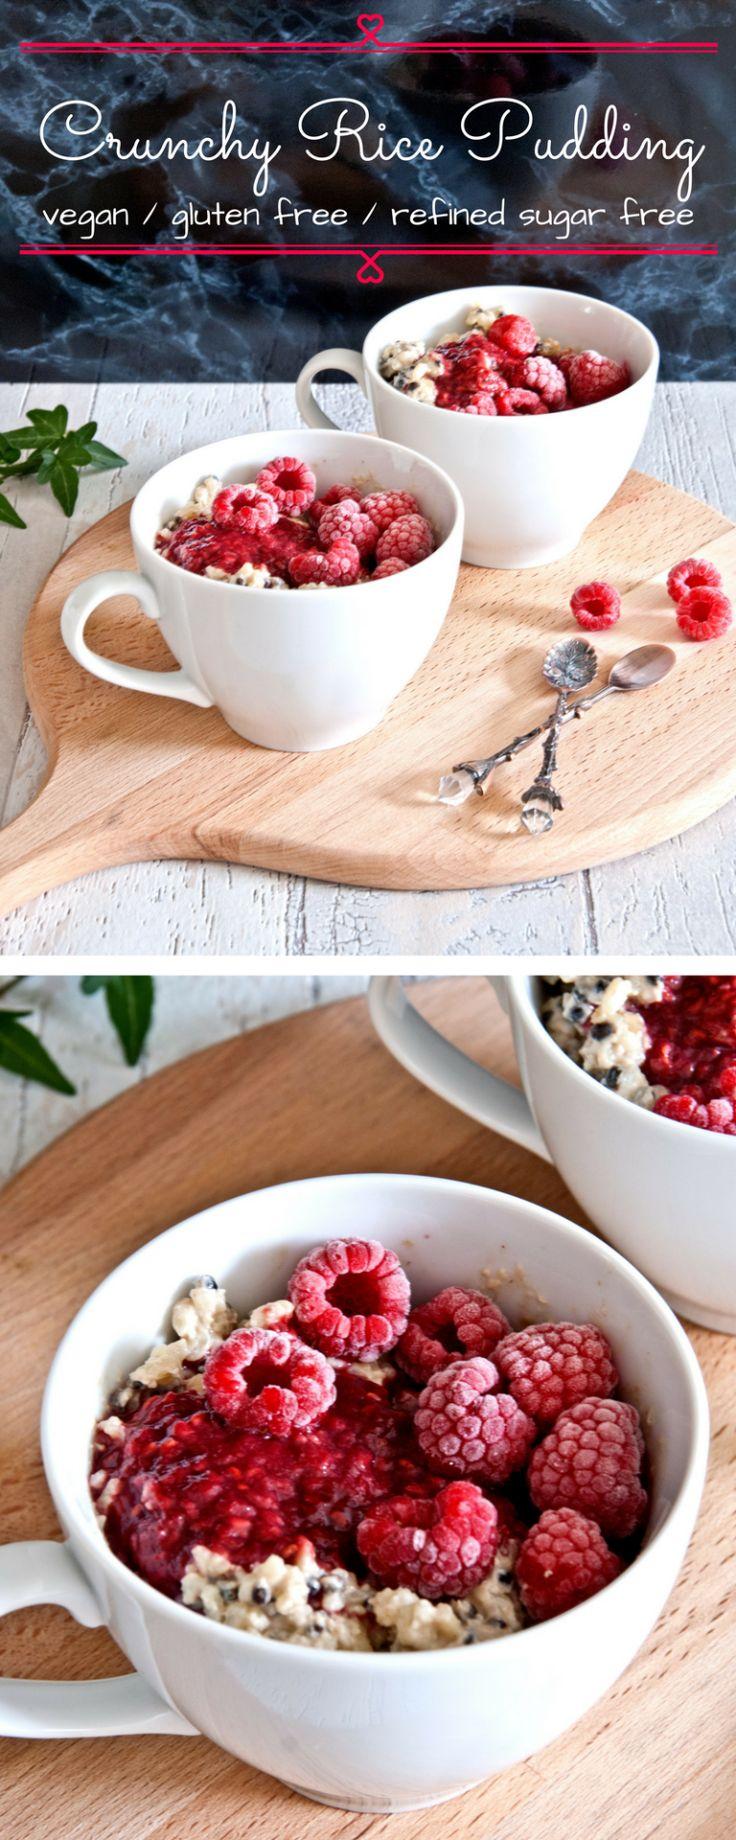 Crunchy vegan almond ricepudding with raspberry compott - delicious dessert